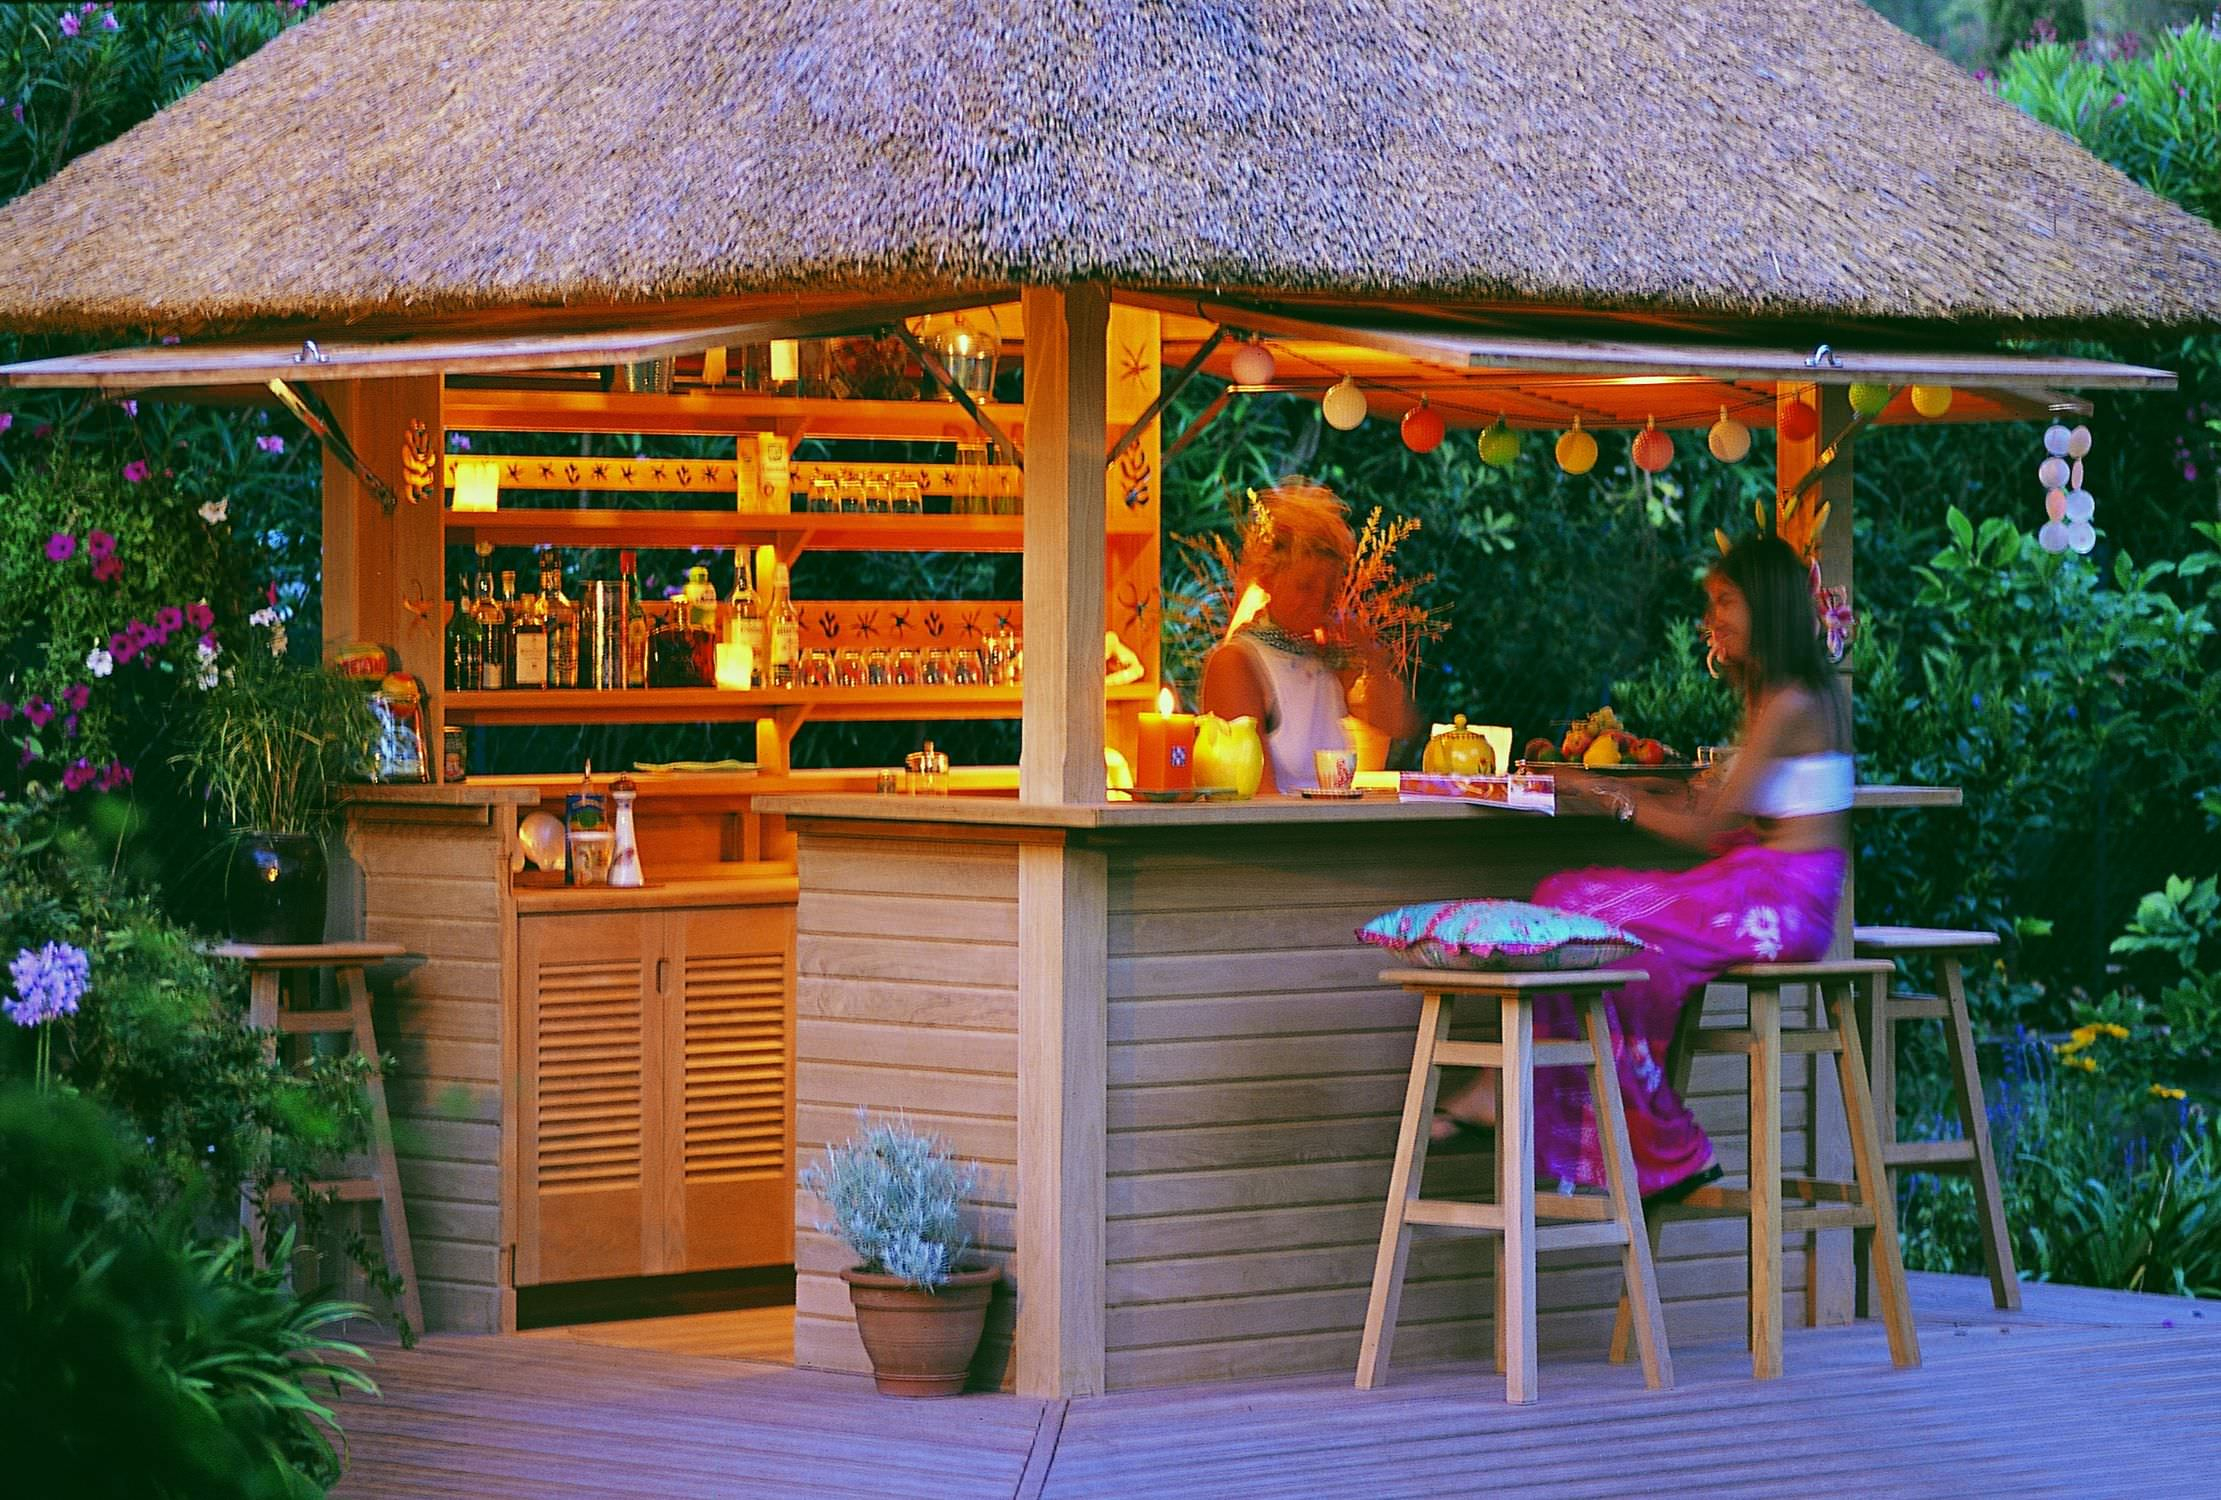 Home Garden Bar - Pirate's Tavern - Honeymoon encequiconcerne Paillote Jardin